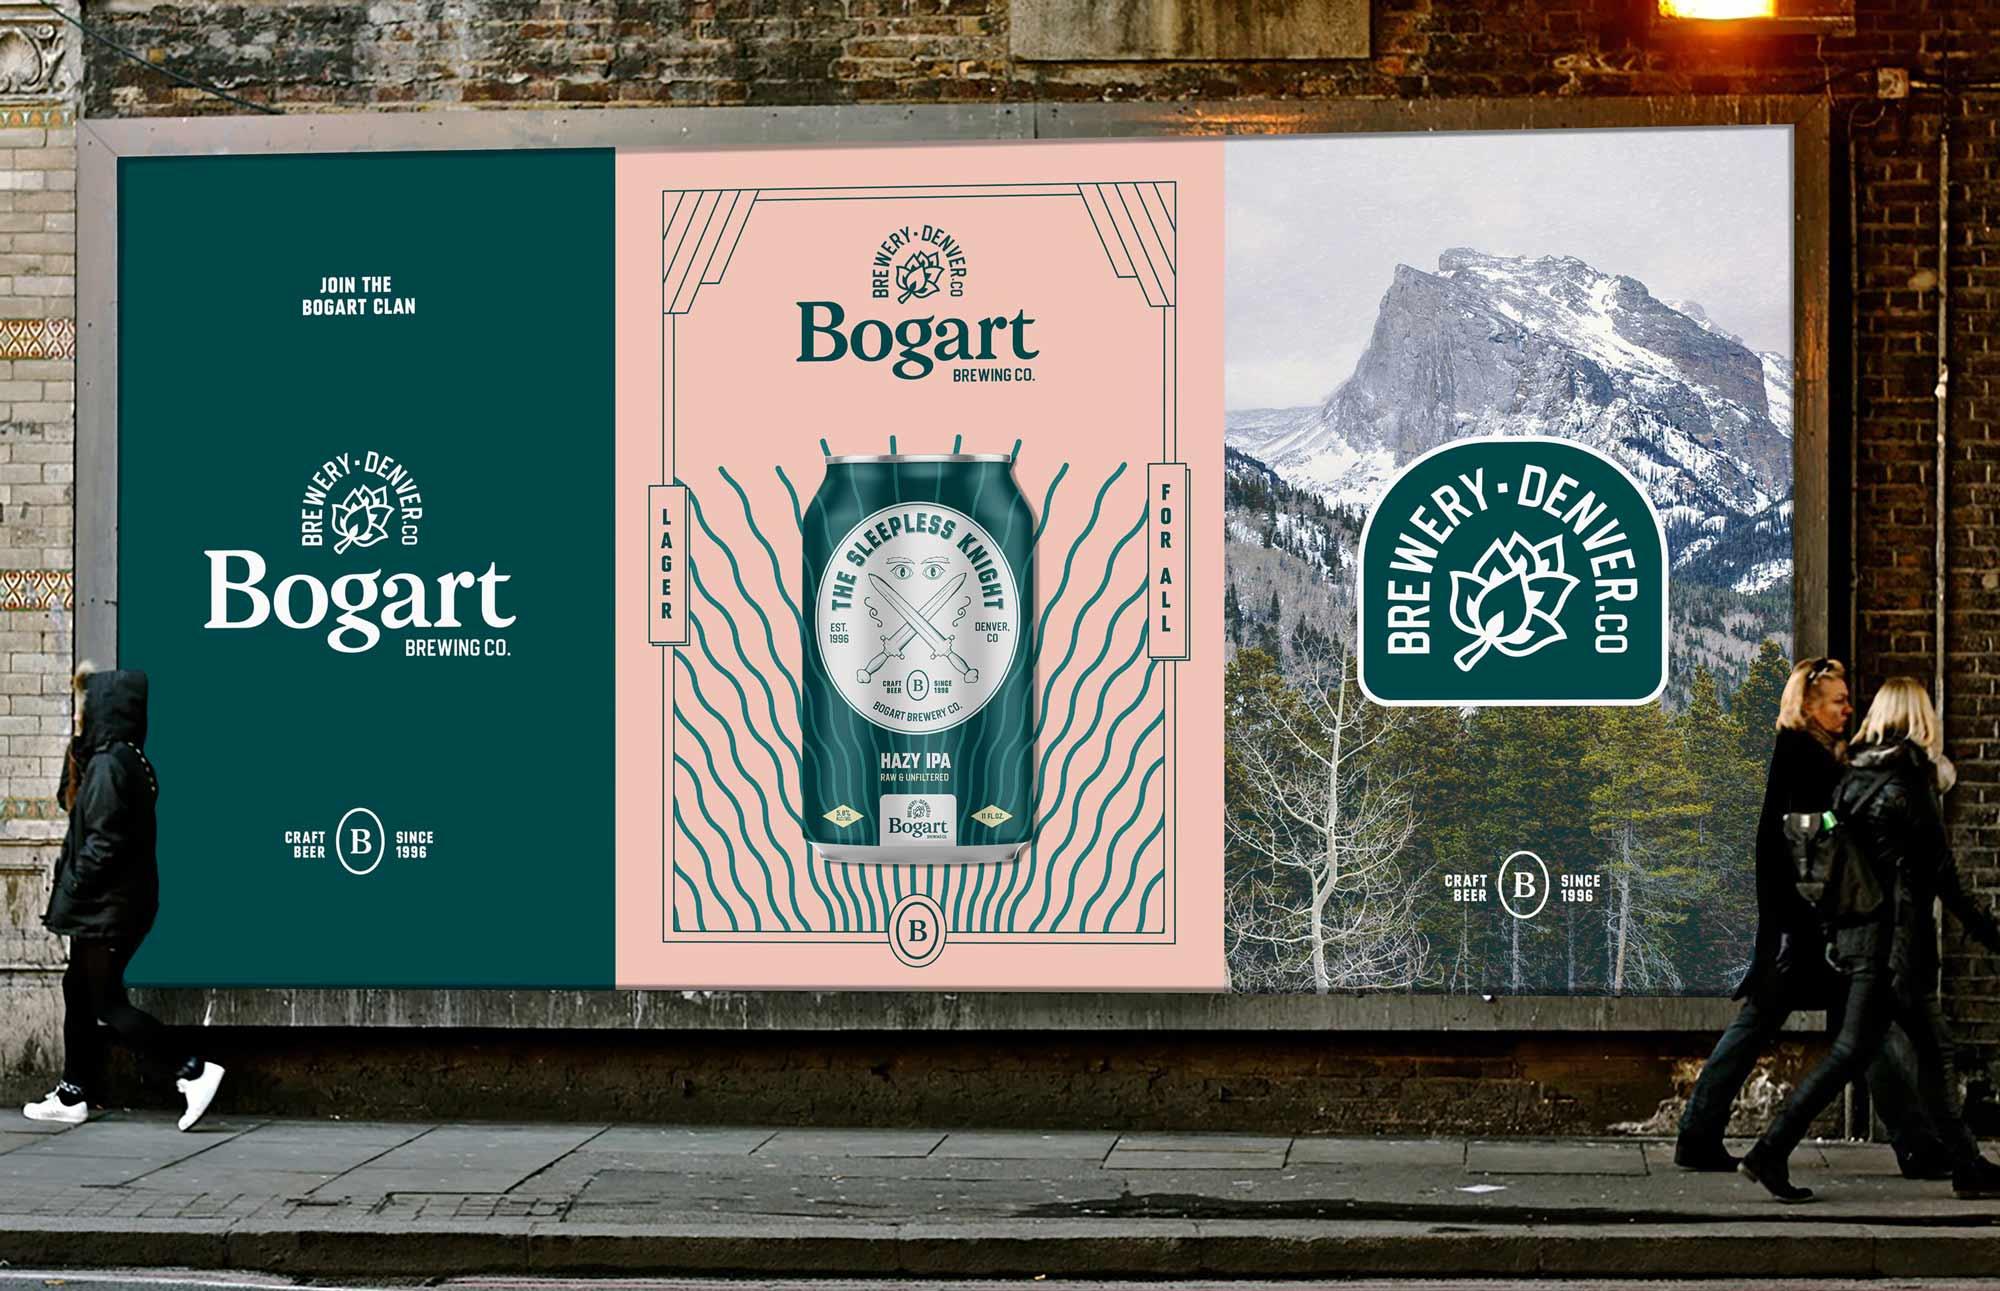 Bogart brewery craft brewery branding  street wall posters mockup vintage Kalistostudio craft beer design